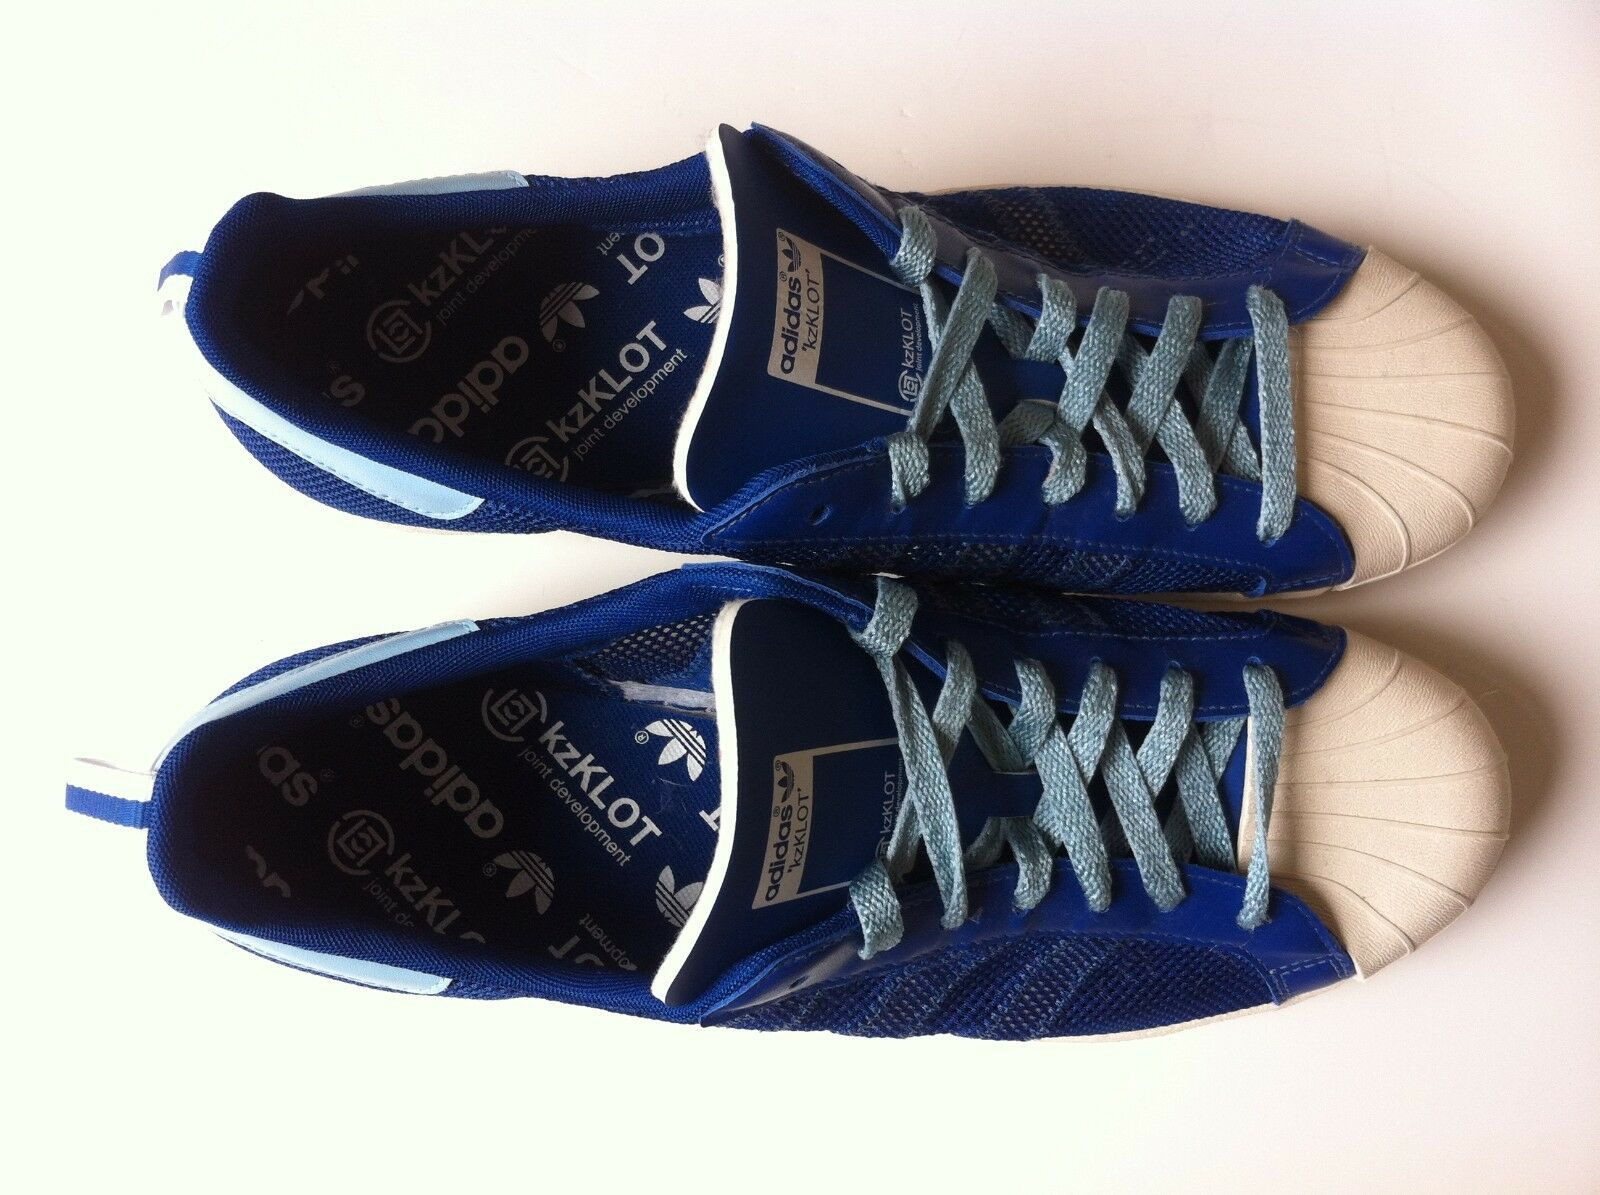 ADIDAS ADIDAS ADIDAS Kazuki  SUPERSTARS 1980 S CLOT G63523 blueE WHITE US 12 UK 11.5 EUR 46 2 3 1571d2